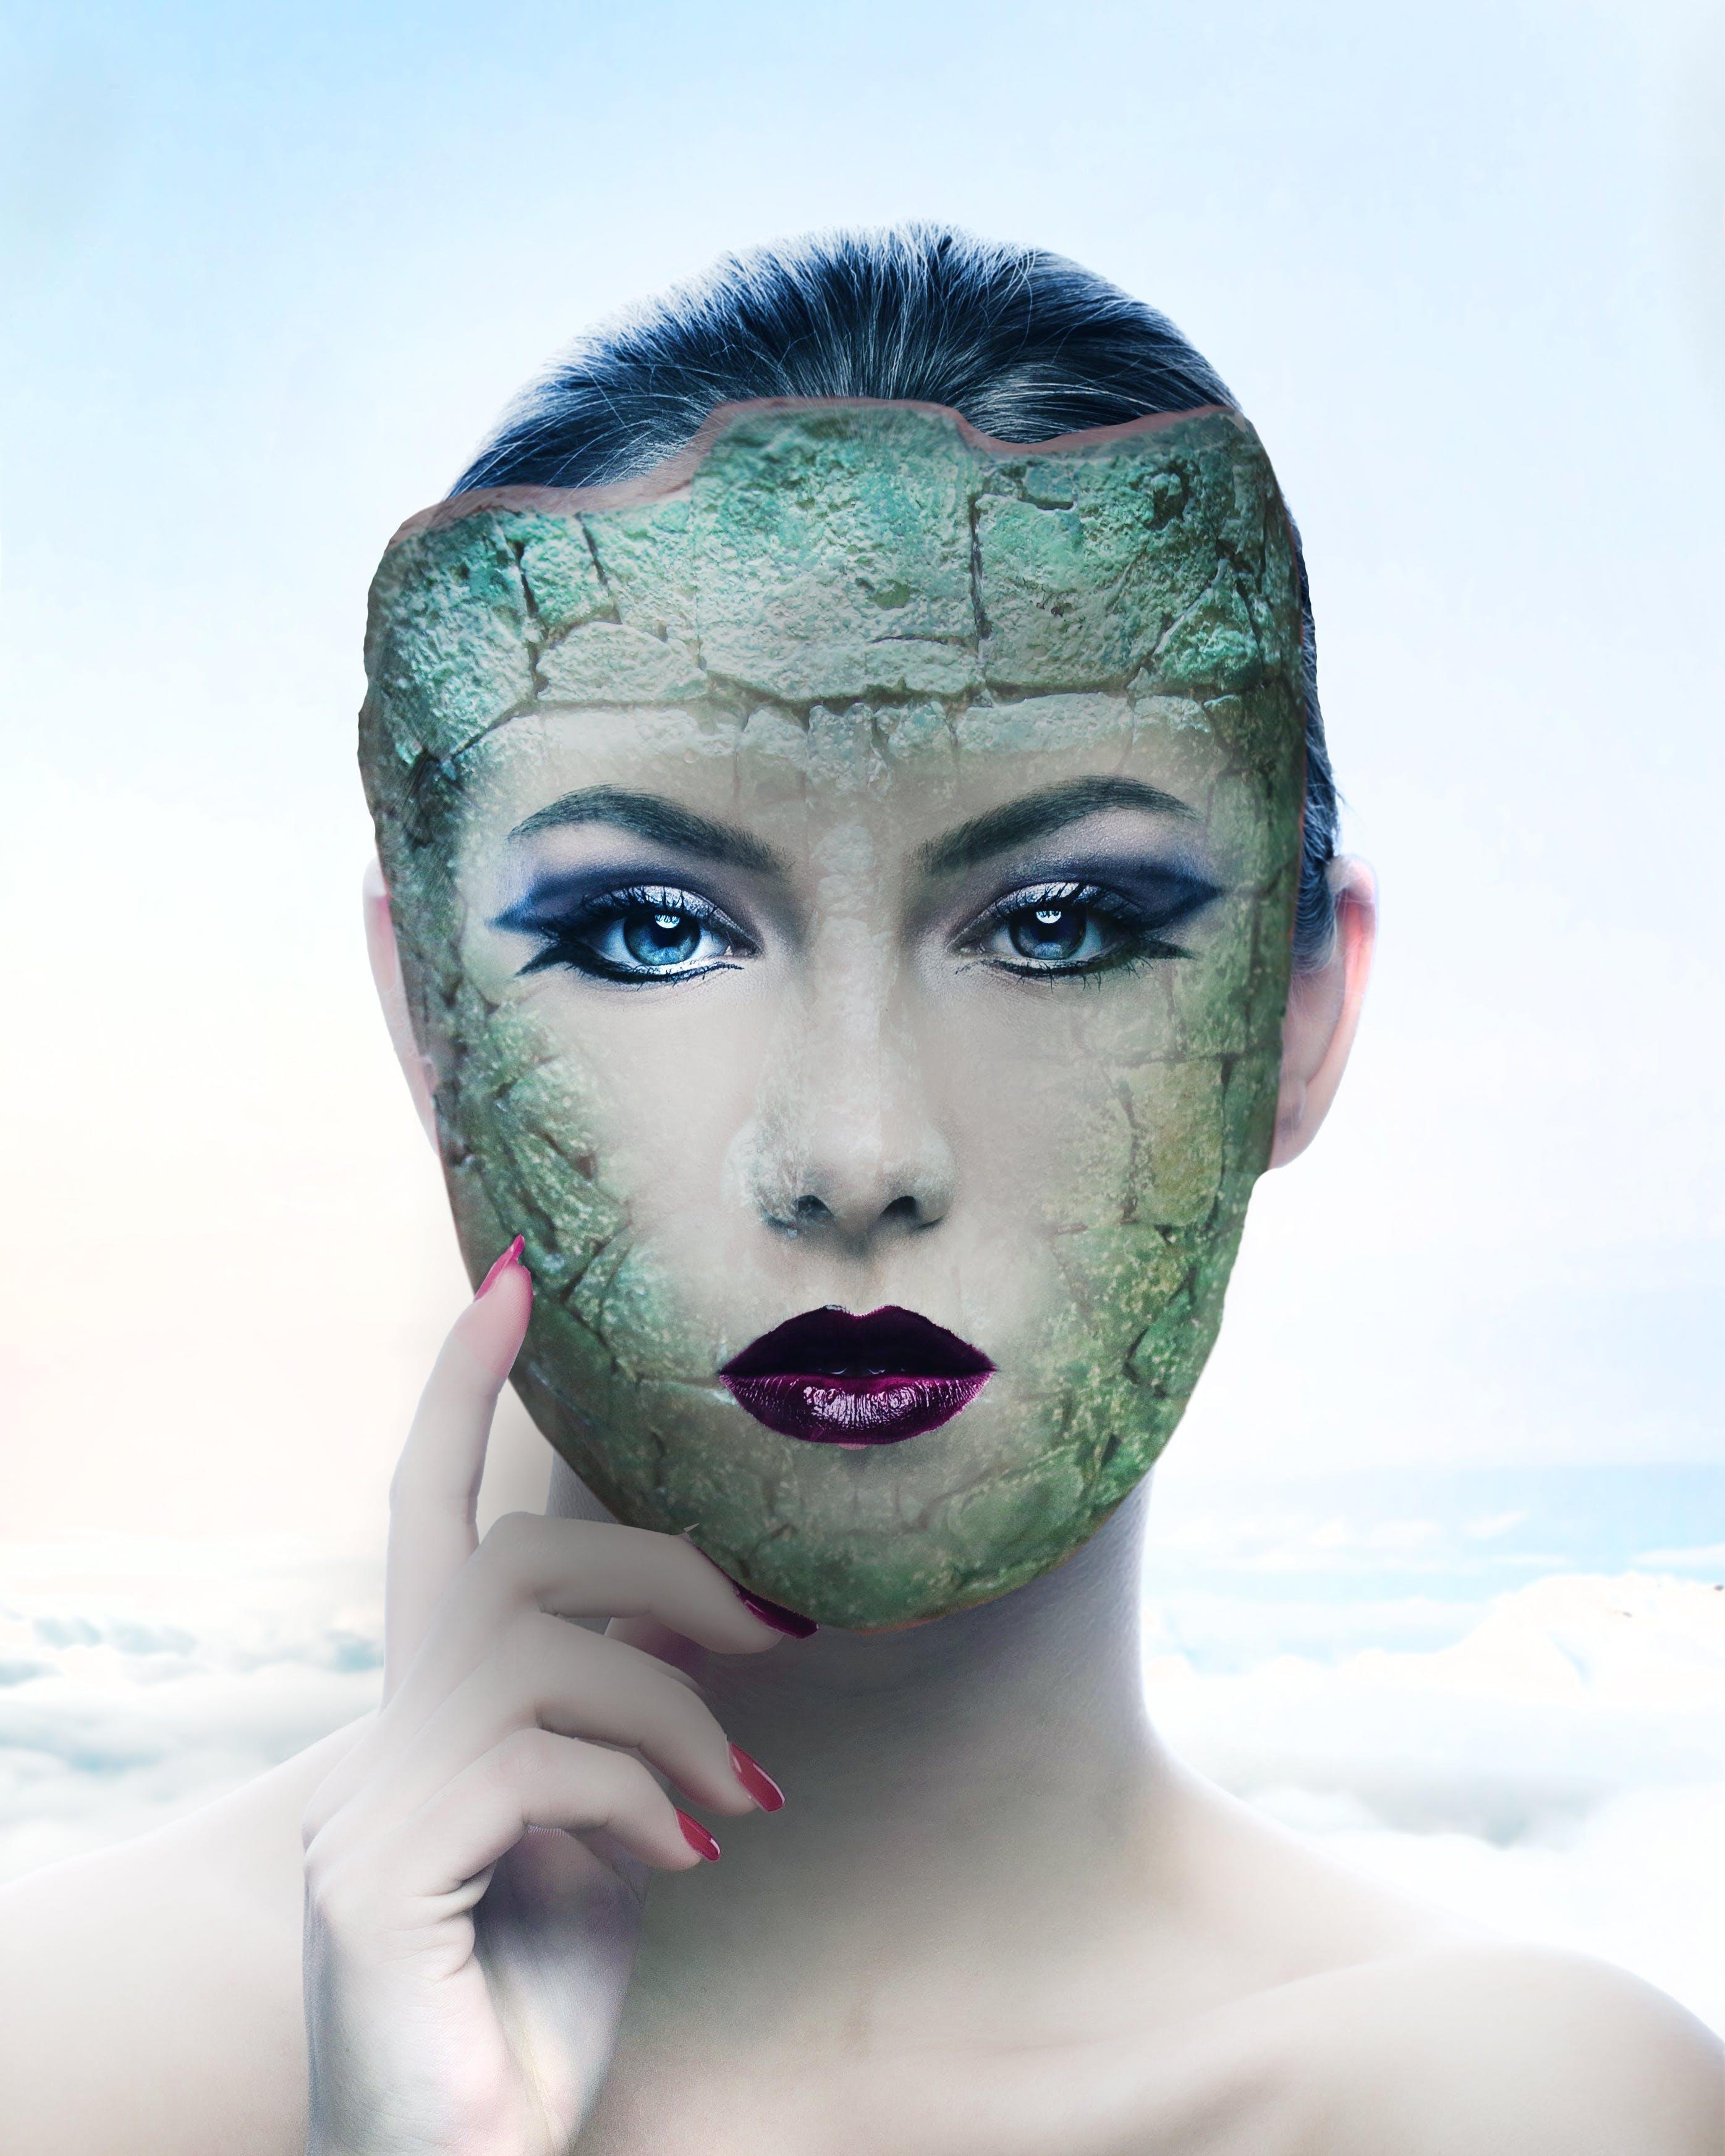 Free stock photo of girl, imagination, lightroom, mascara